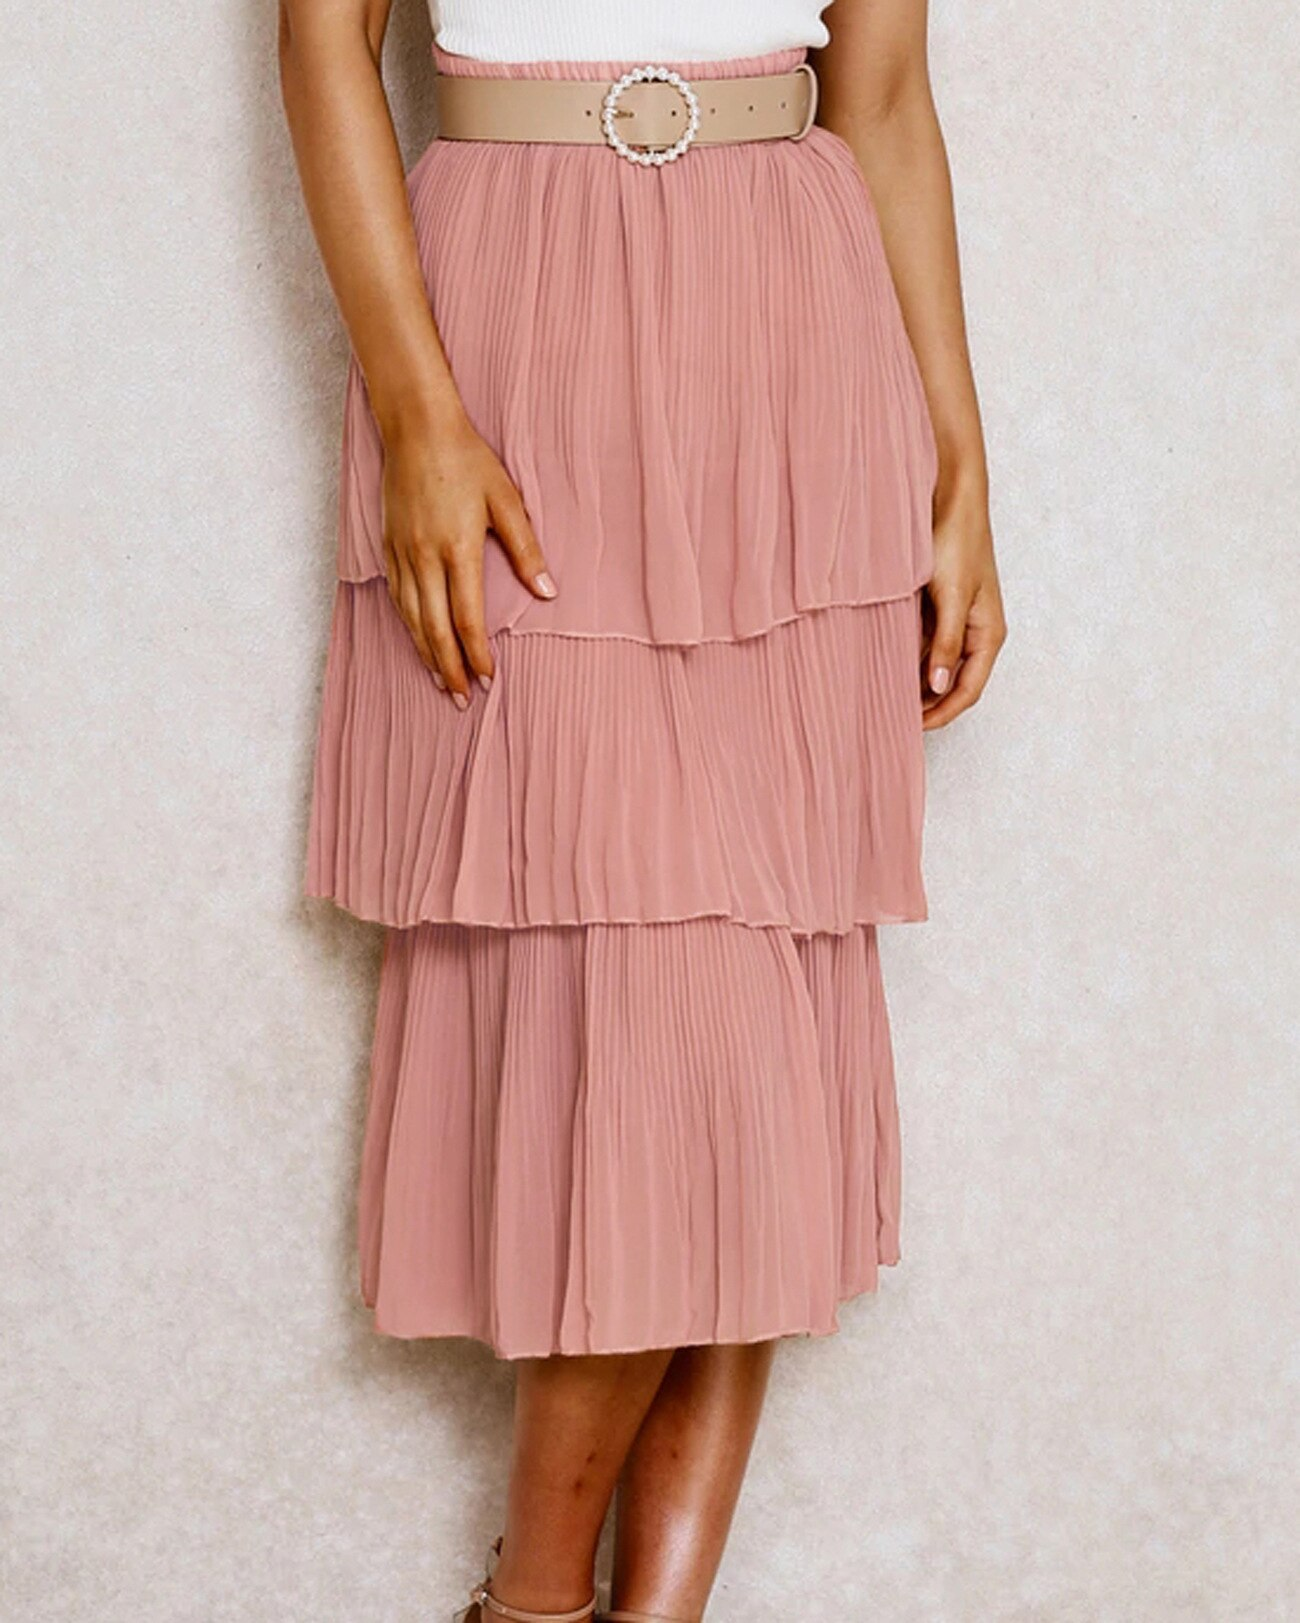 Women 3 Layered Long Skirt Pink White Korean Style Skirts Womens Summer Pleated Skirt Chiffon Layer Cake Sun Skirt Female 1